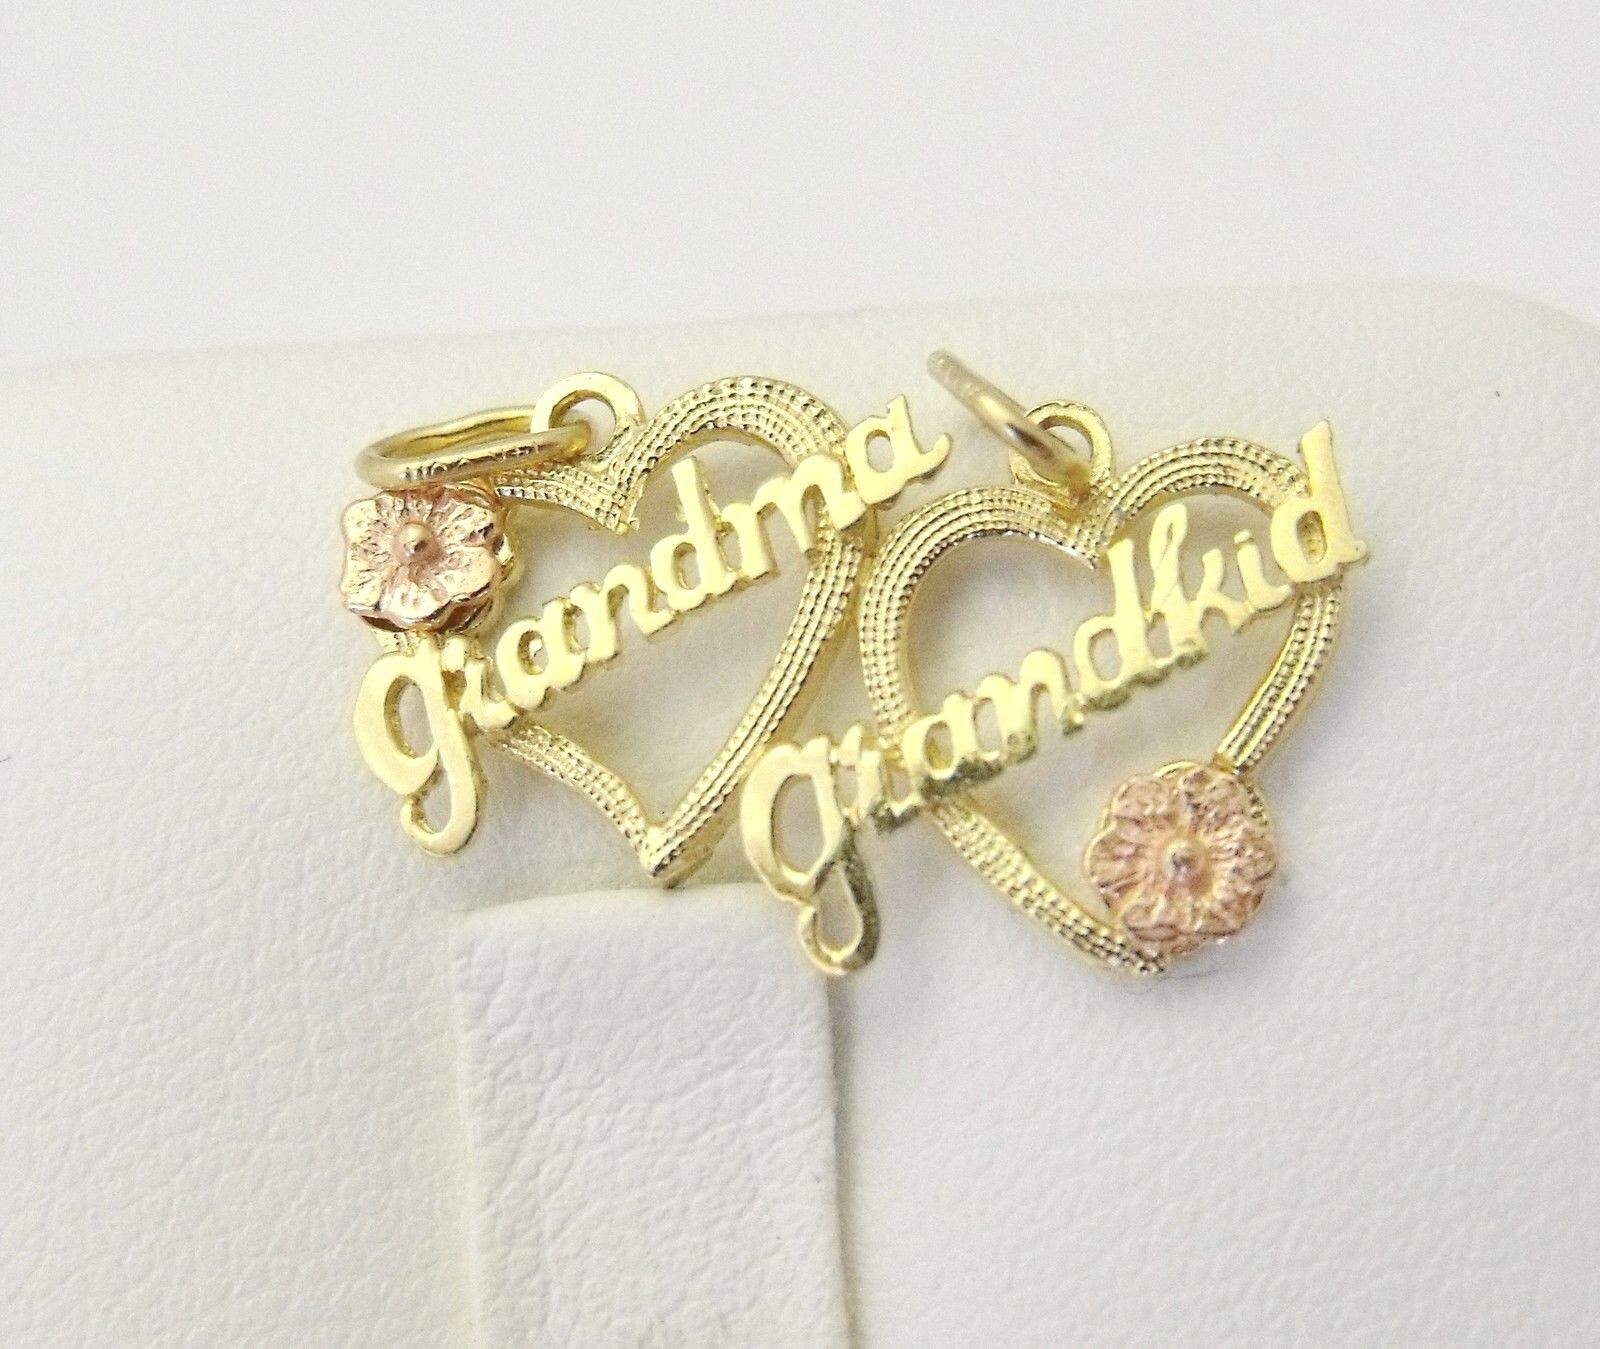 New 14K Yellow & pink gold Double Heart Grandma Grandkid Charm Pendant 1.4gr